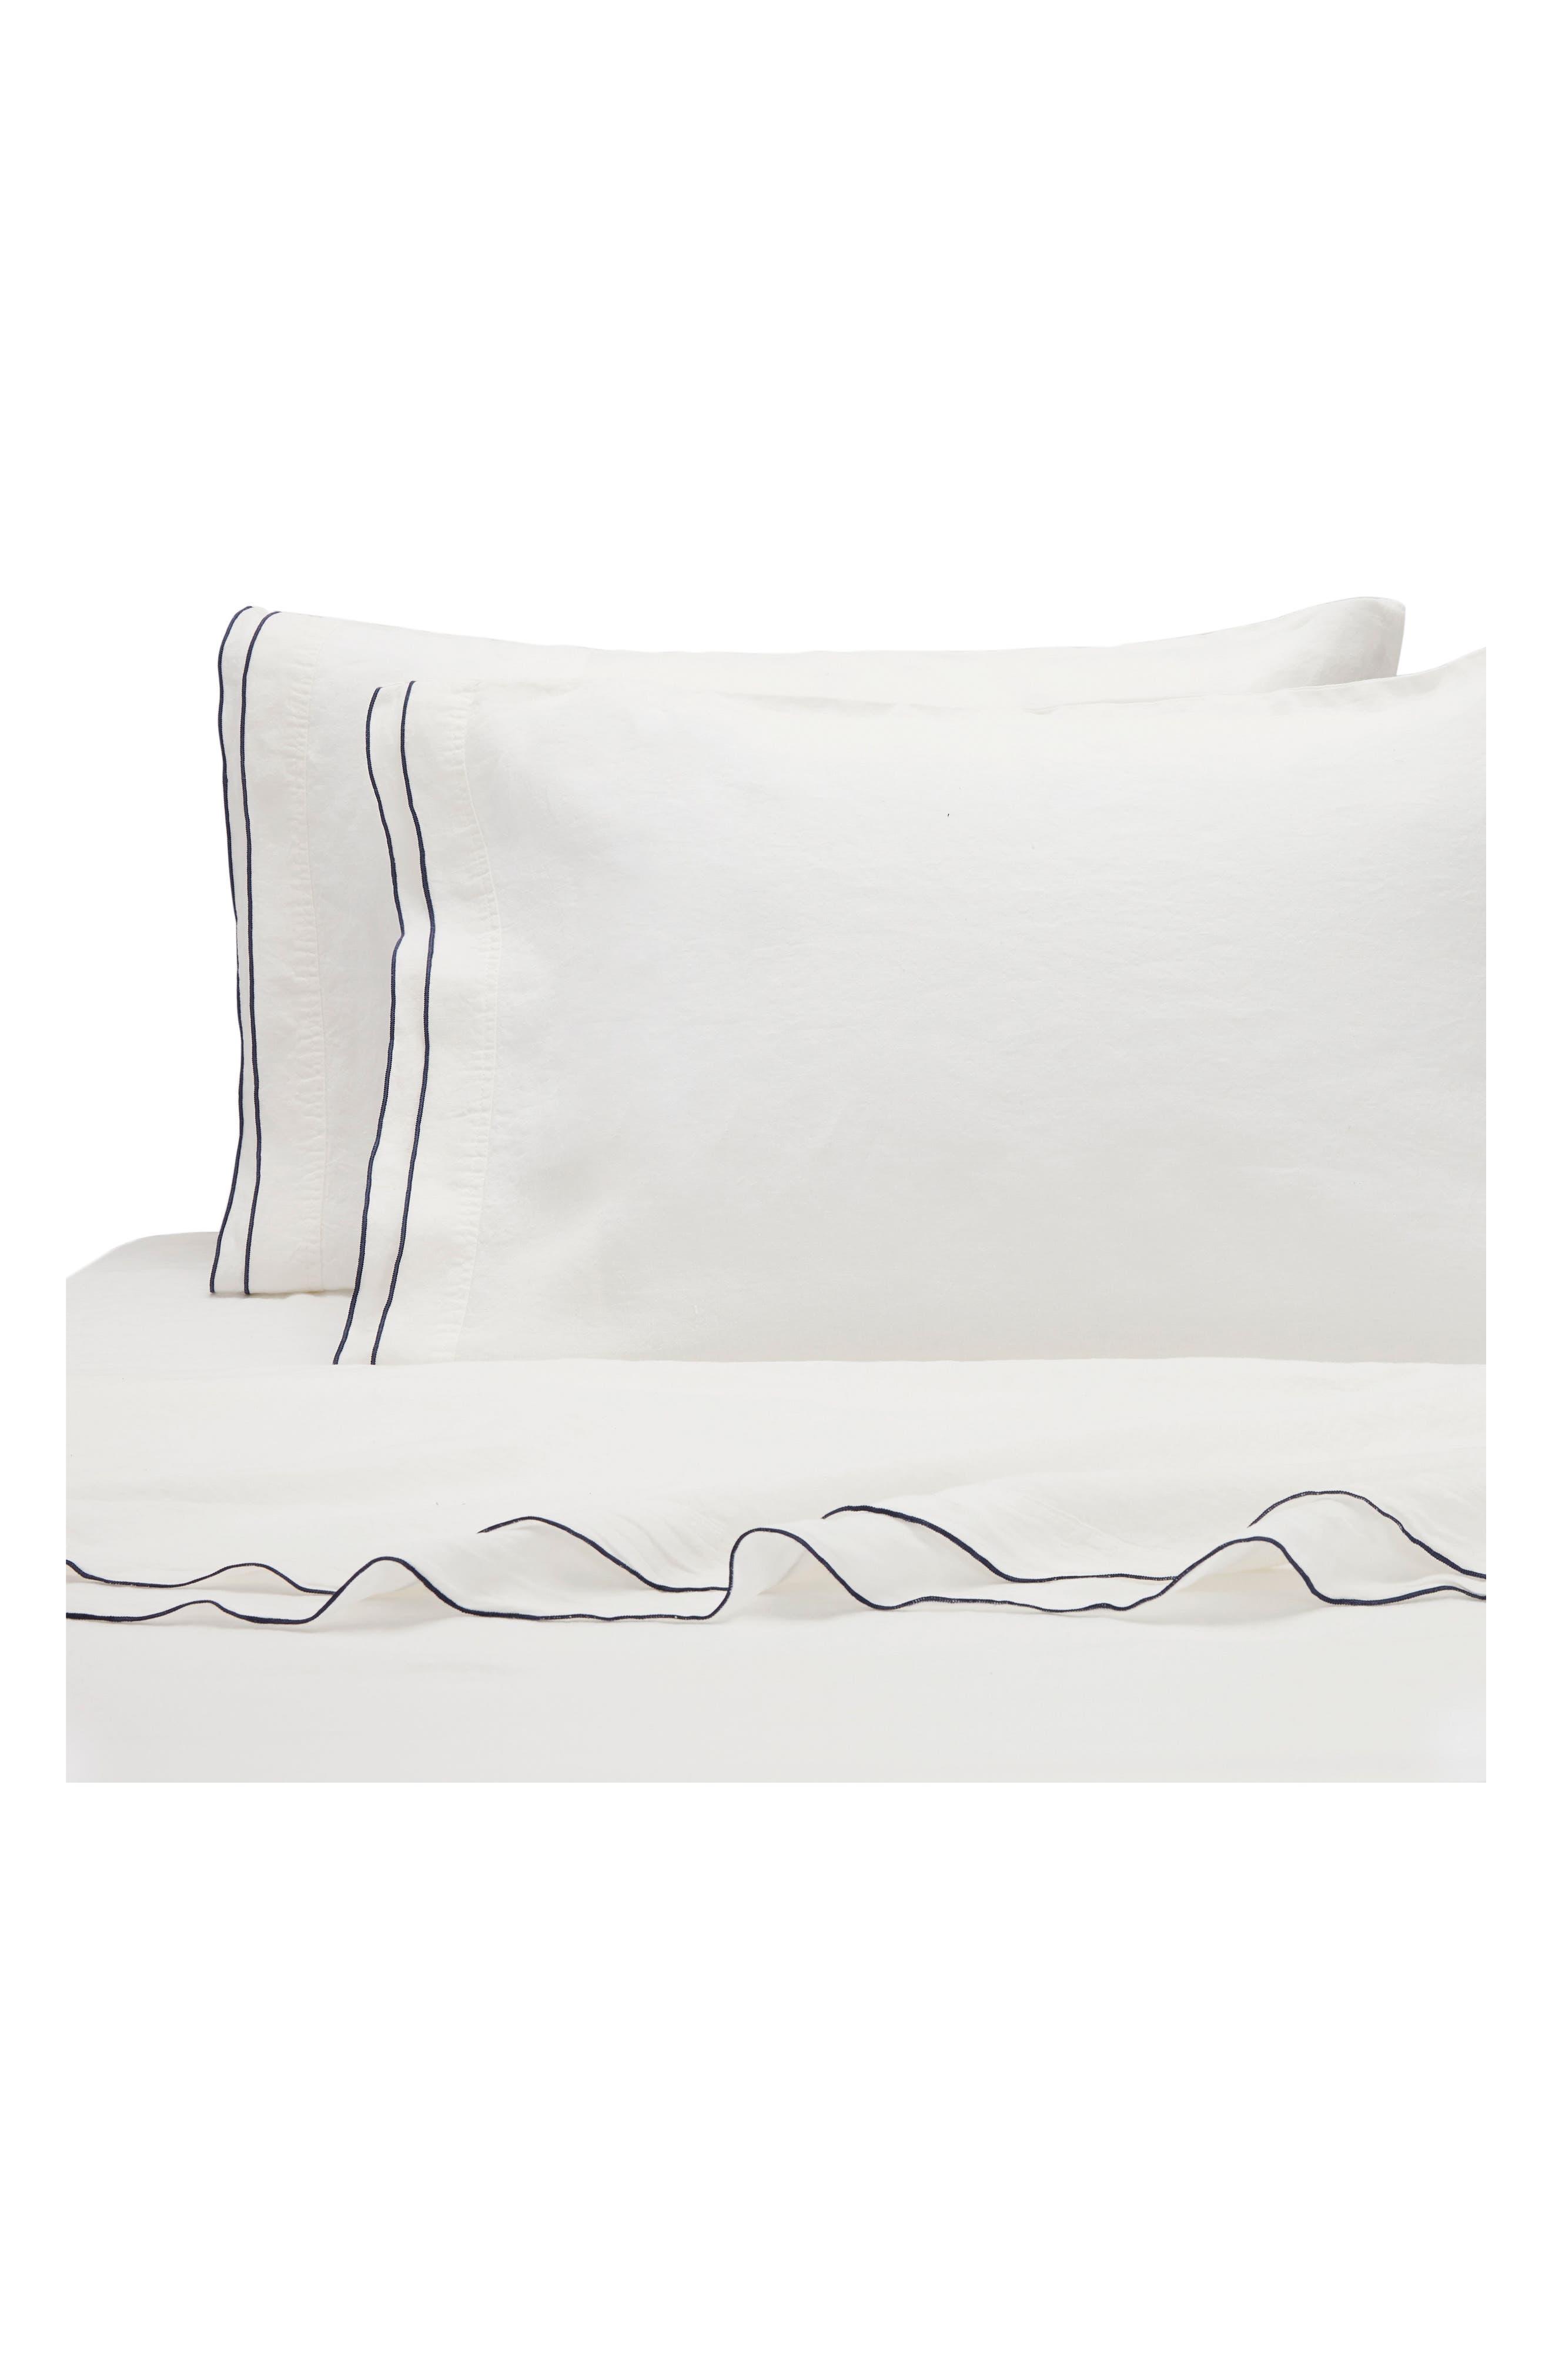 Biarritz Linen 300 Thread Count Pillowcase,                             Alternate thumbnail 2, color,                             100